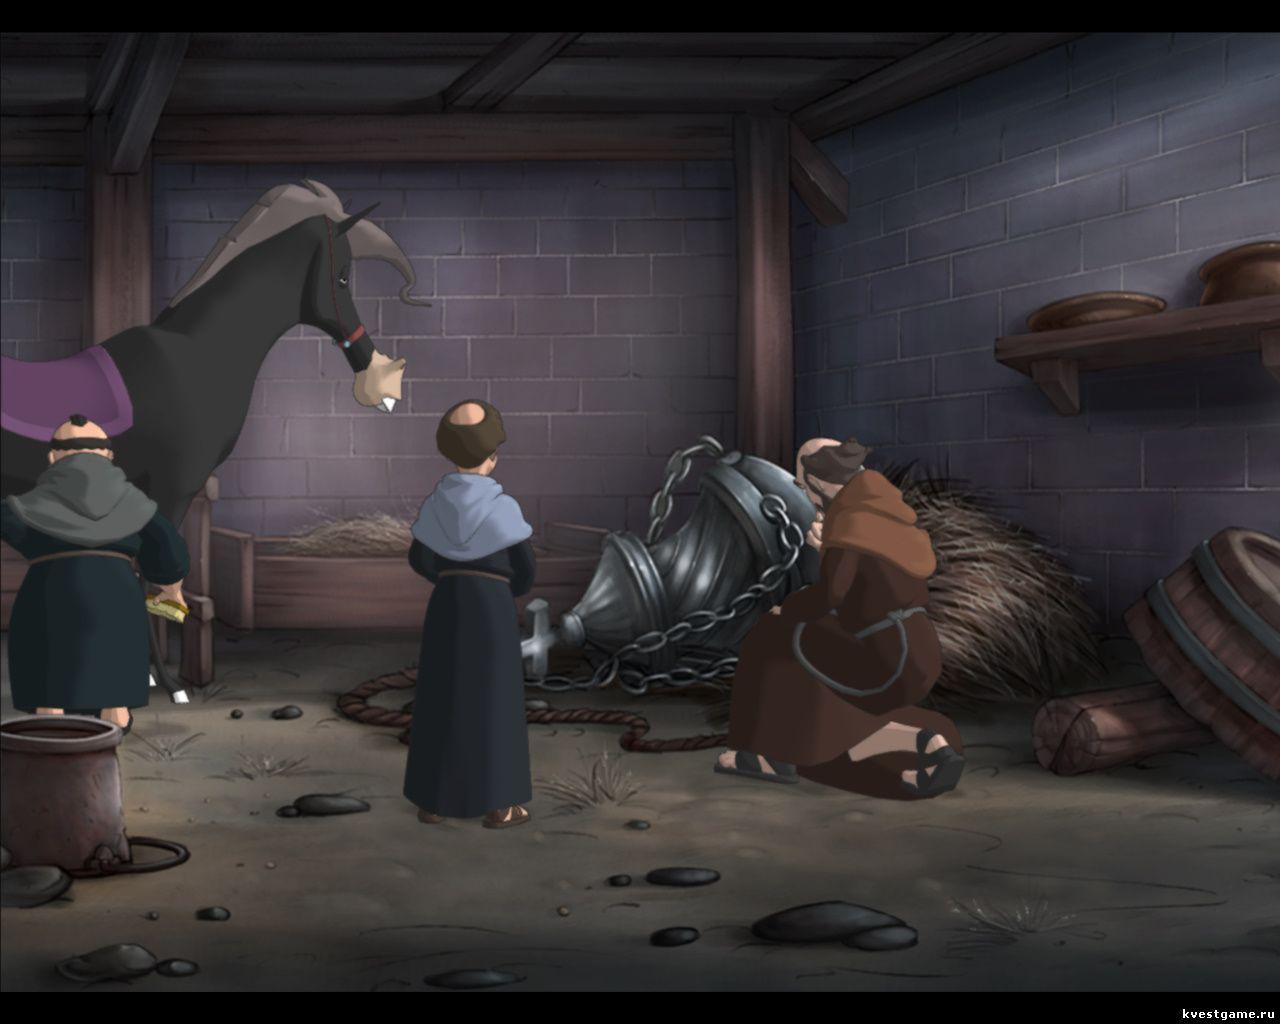 Murder in the Abbey - Леонардо осматривает орудие убийства Ансельма (глава 1)